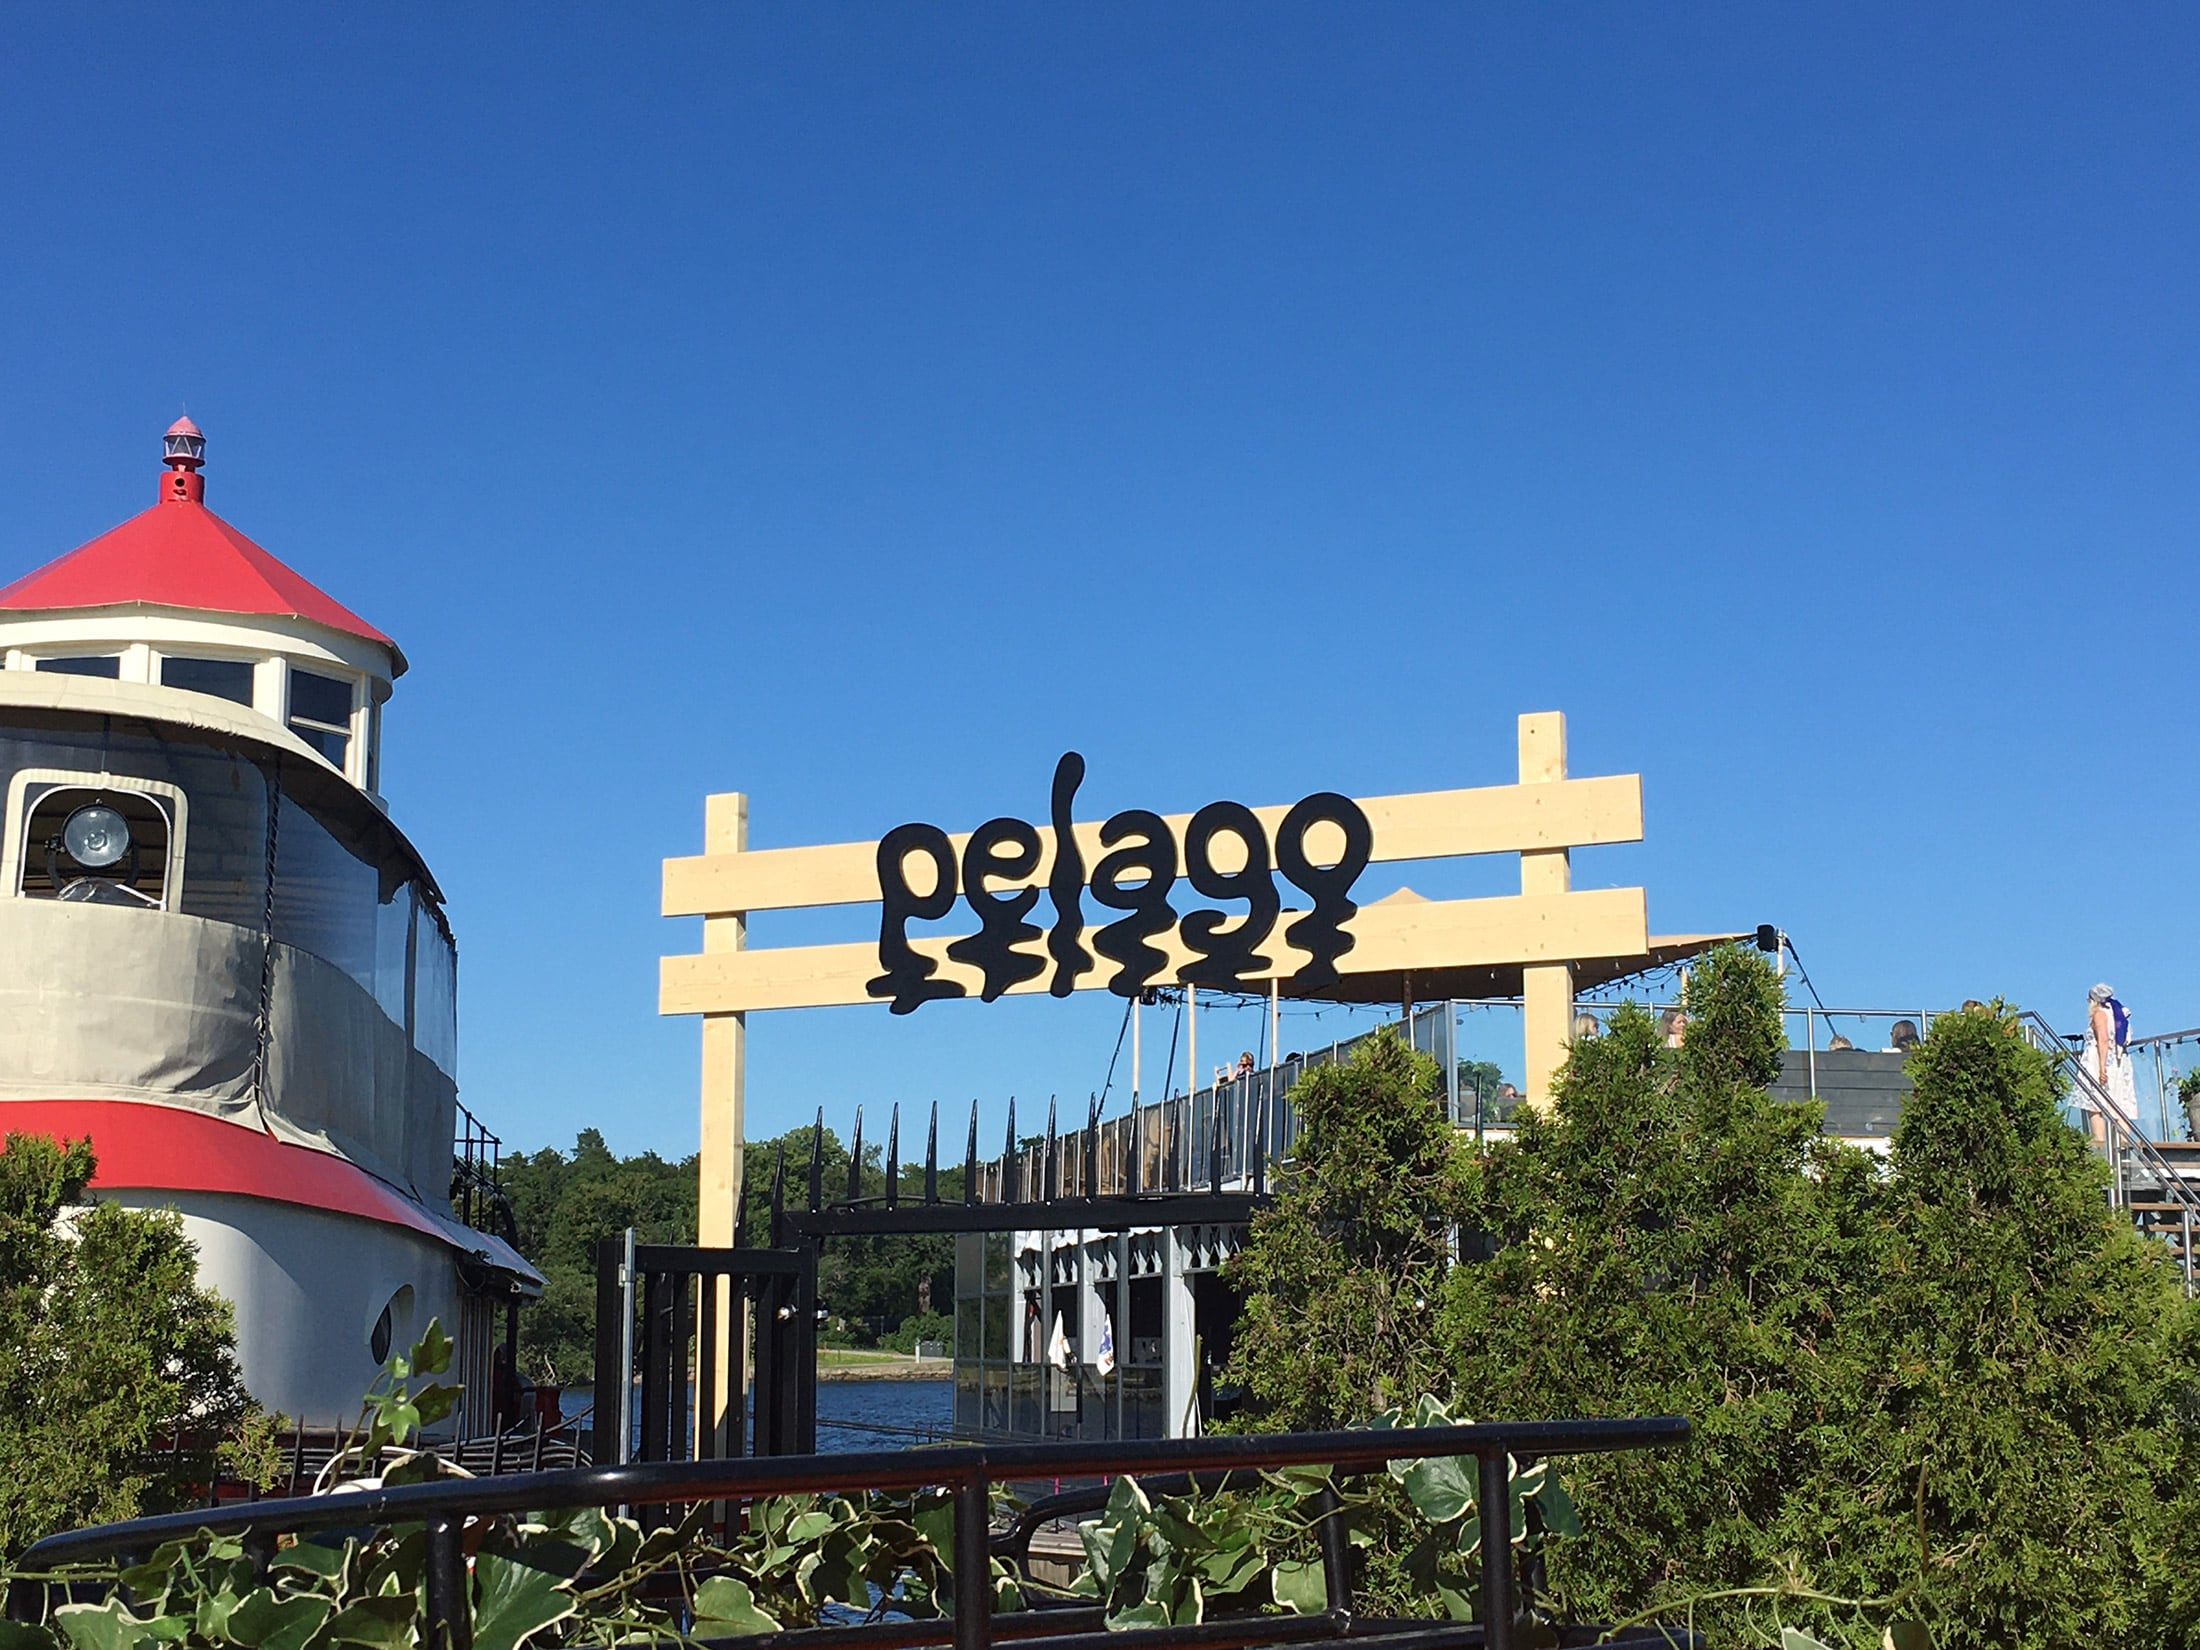 Behind the Amusement Park – Pelago signage